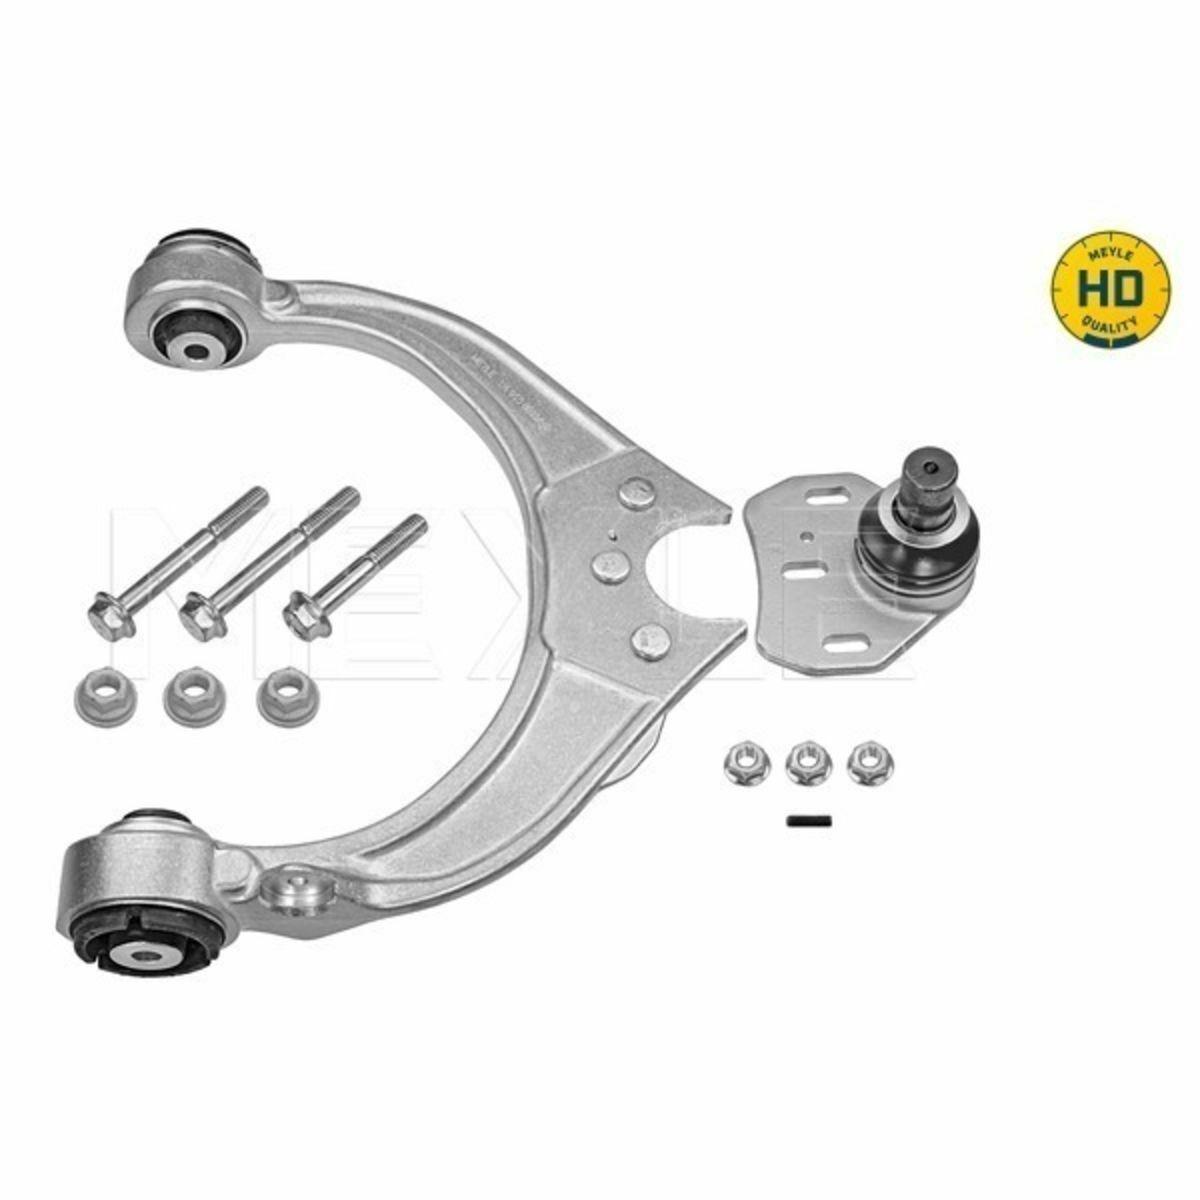 Radaufhängung MEYLE-HD Quality MEYLE 316 050 0038//HD Lenker